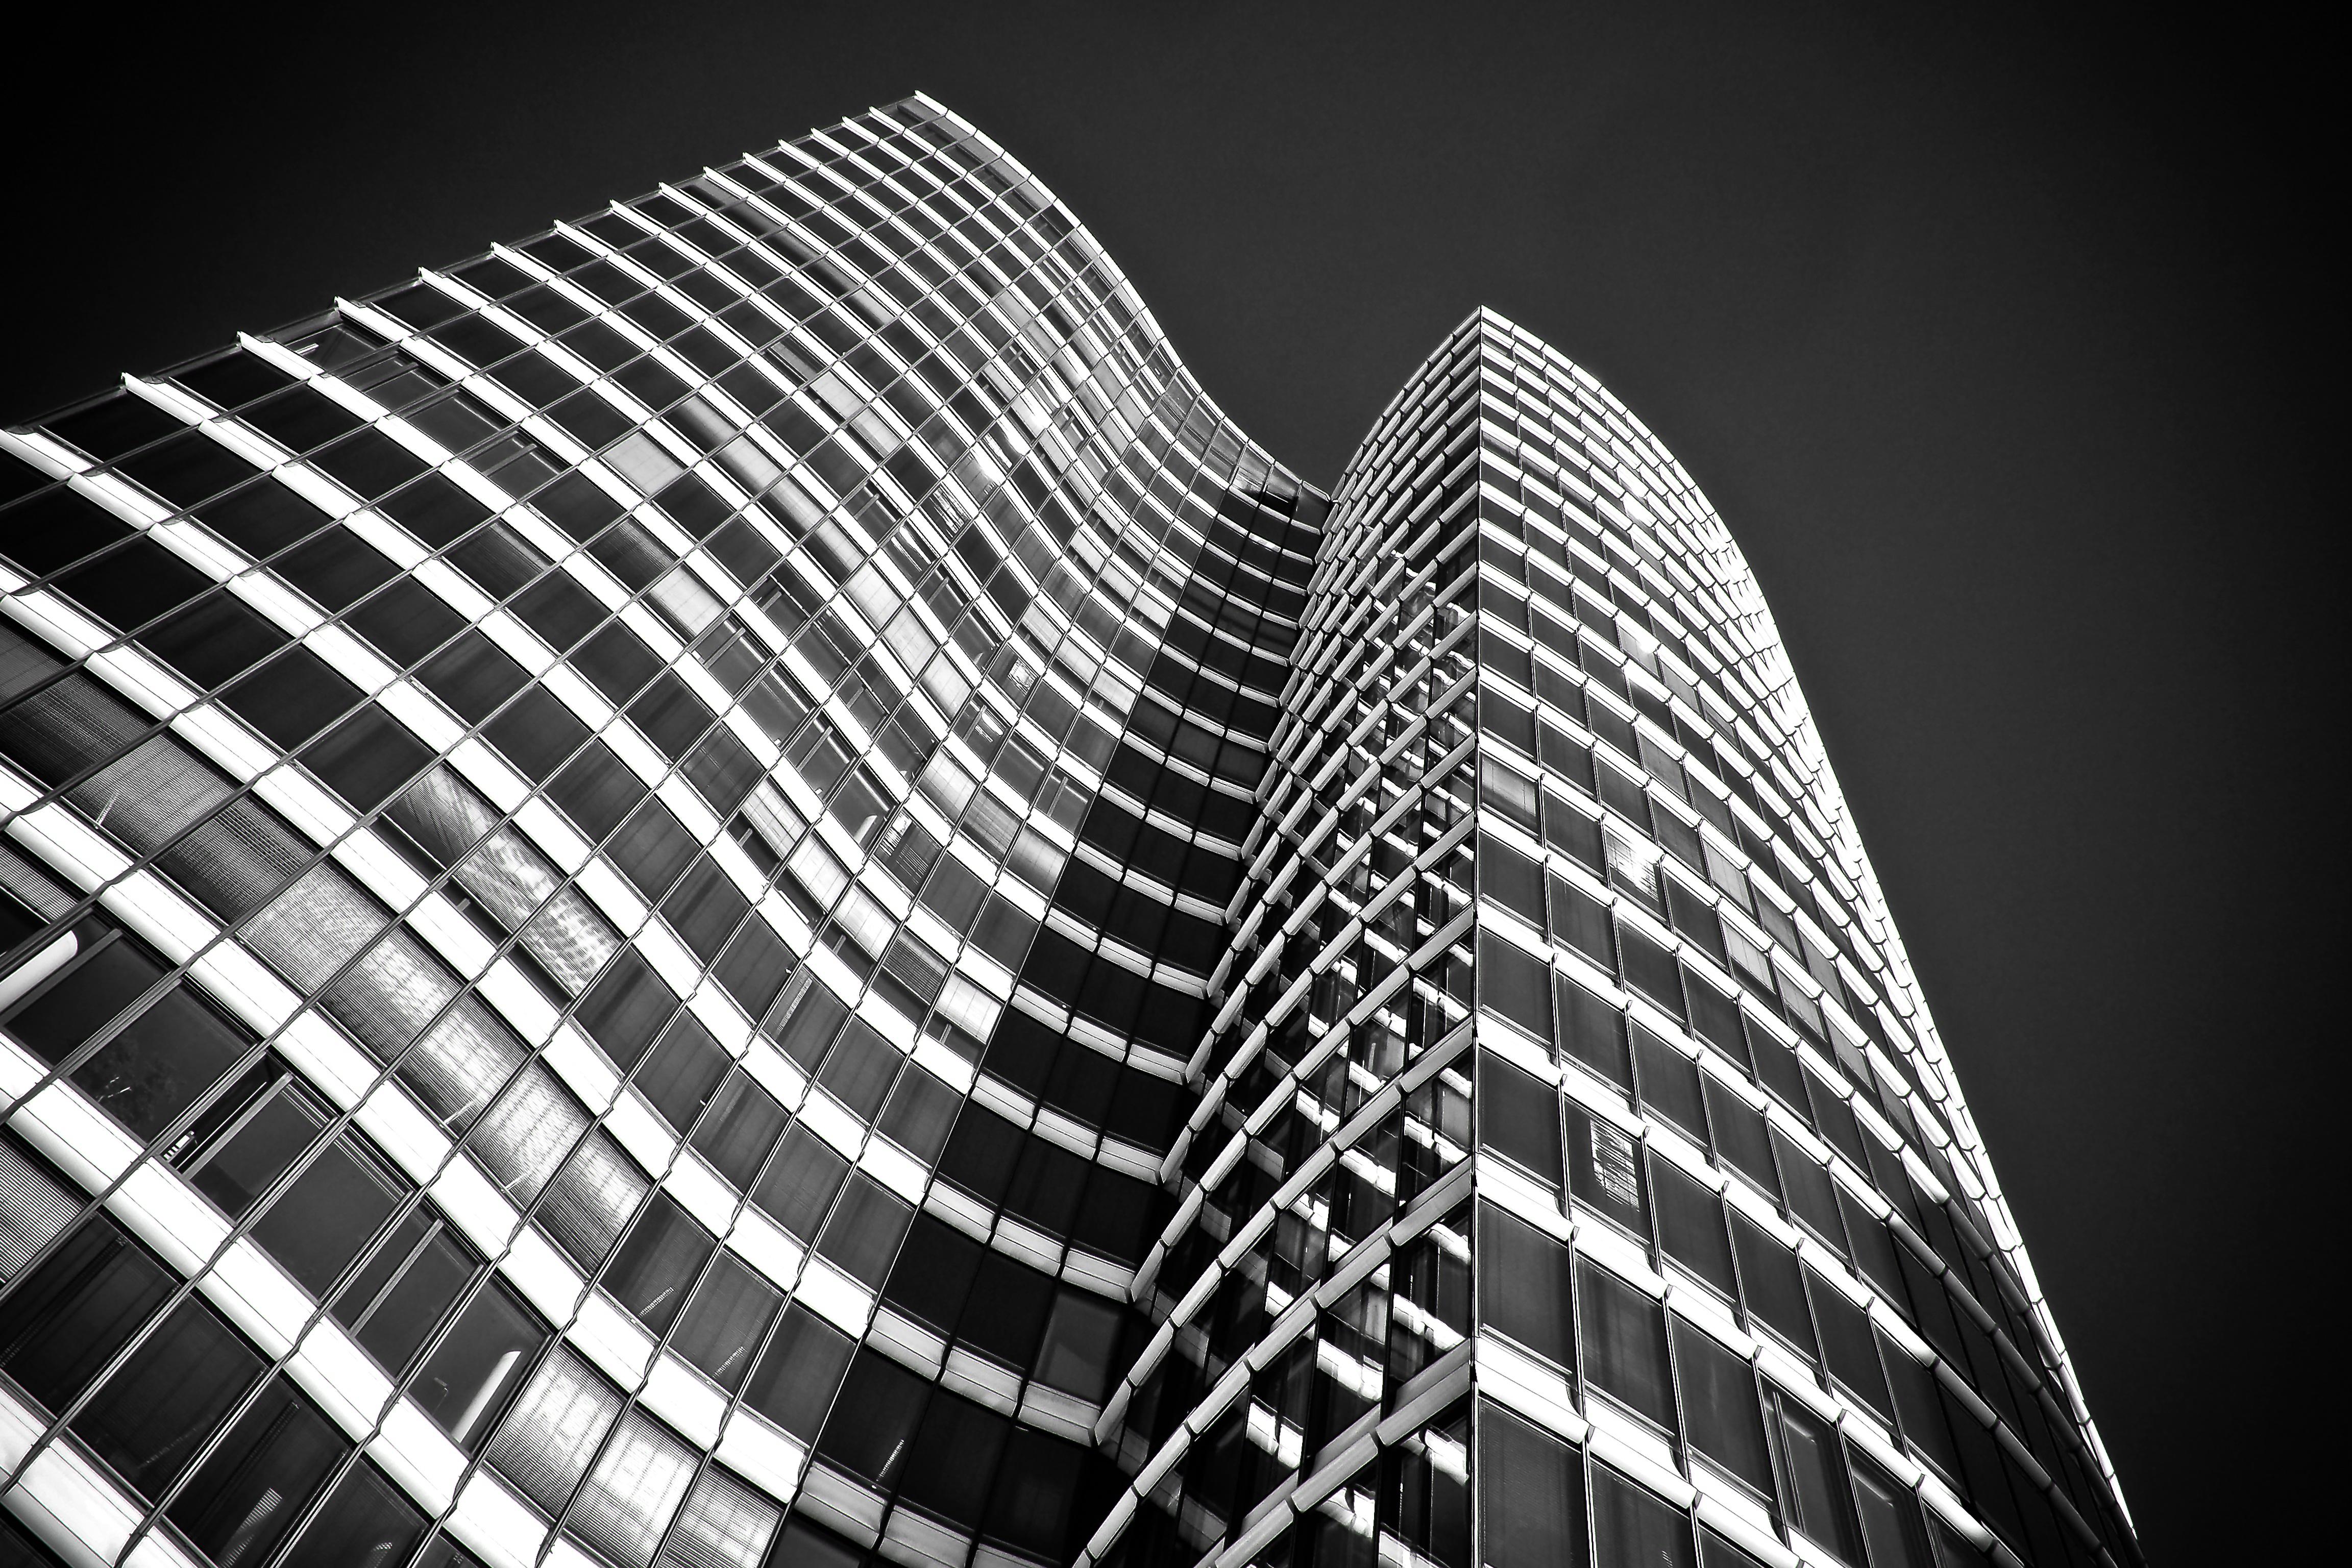 Buildings Architecture Monchrome 4k, HD Others, 4k